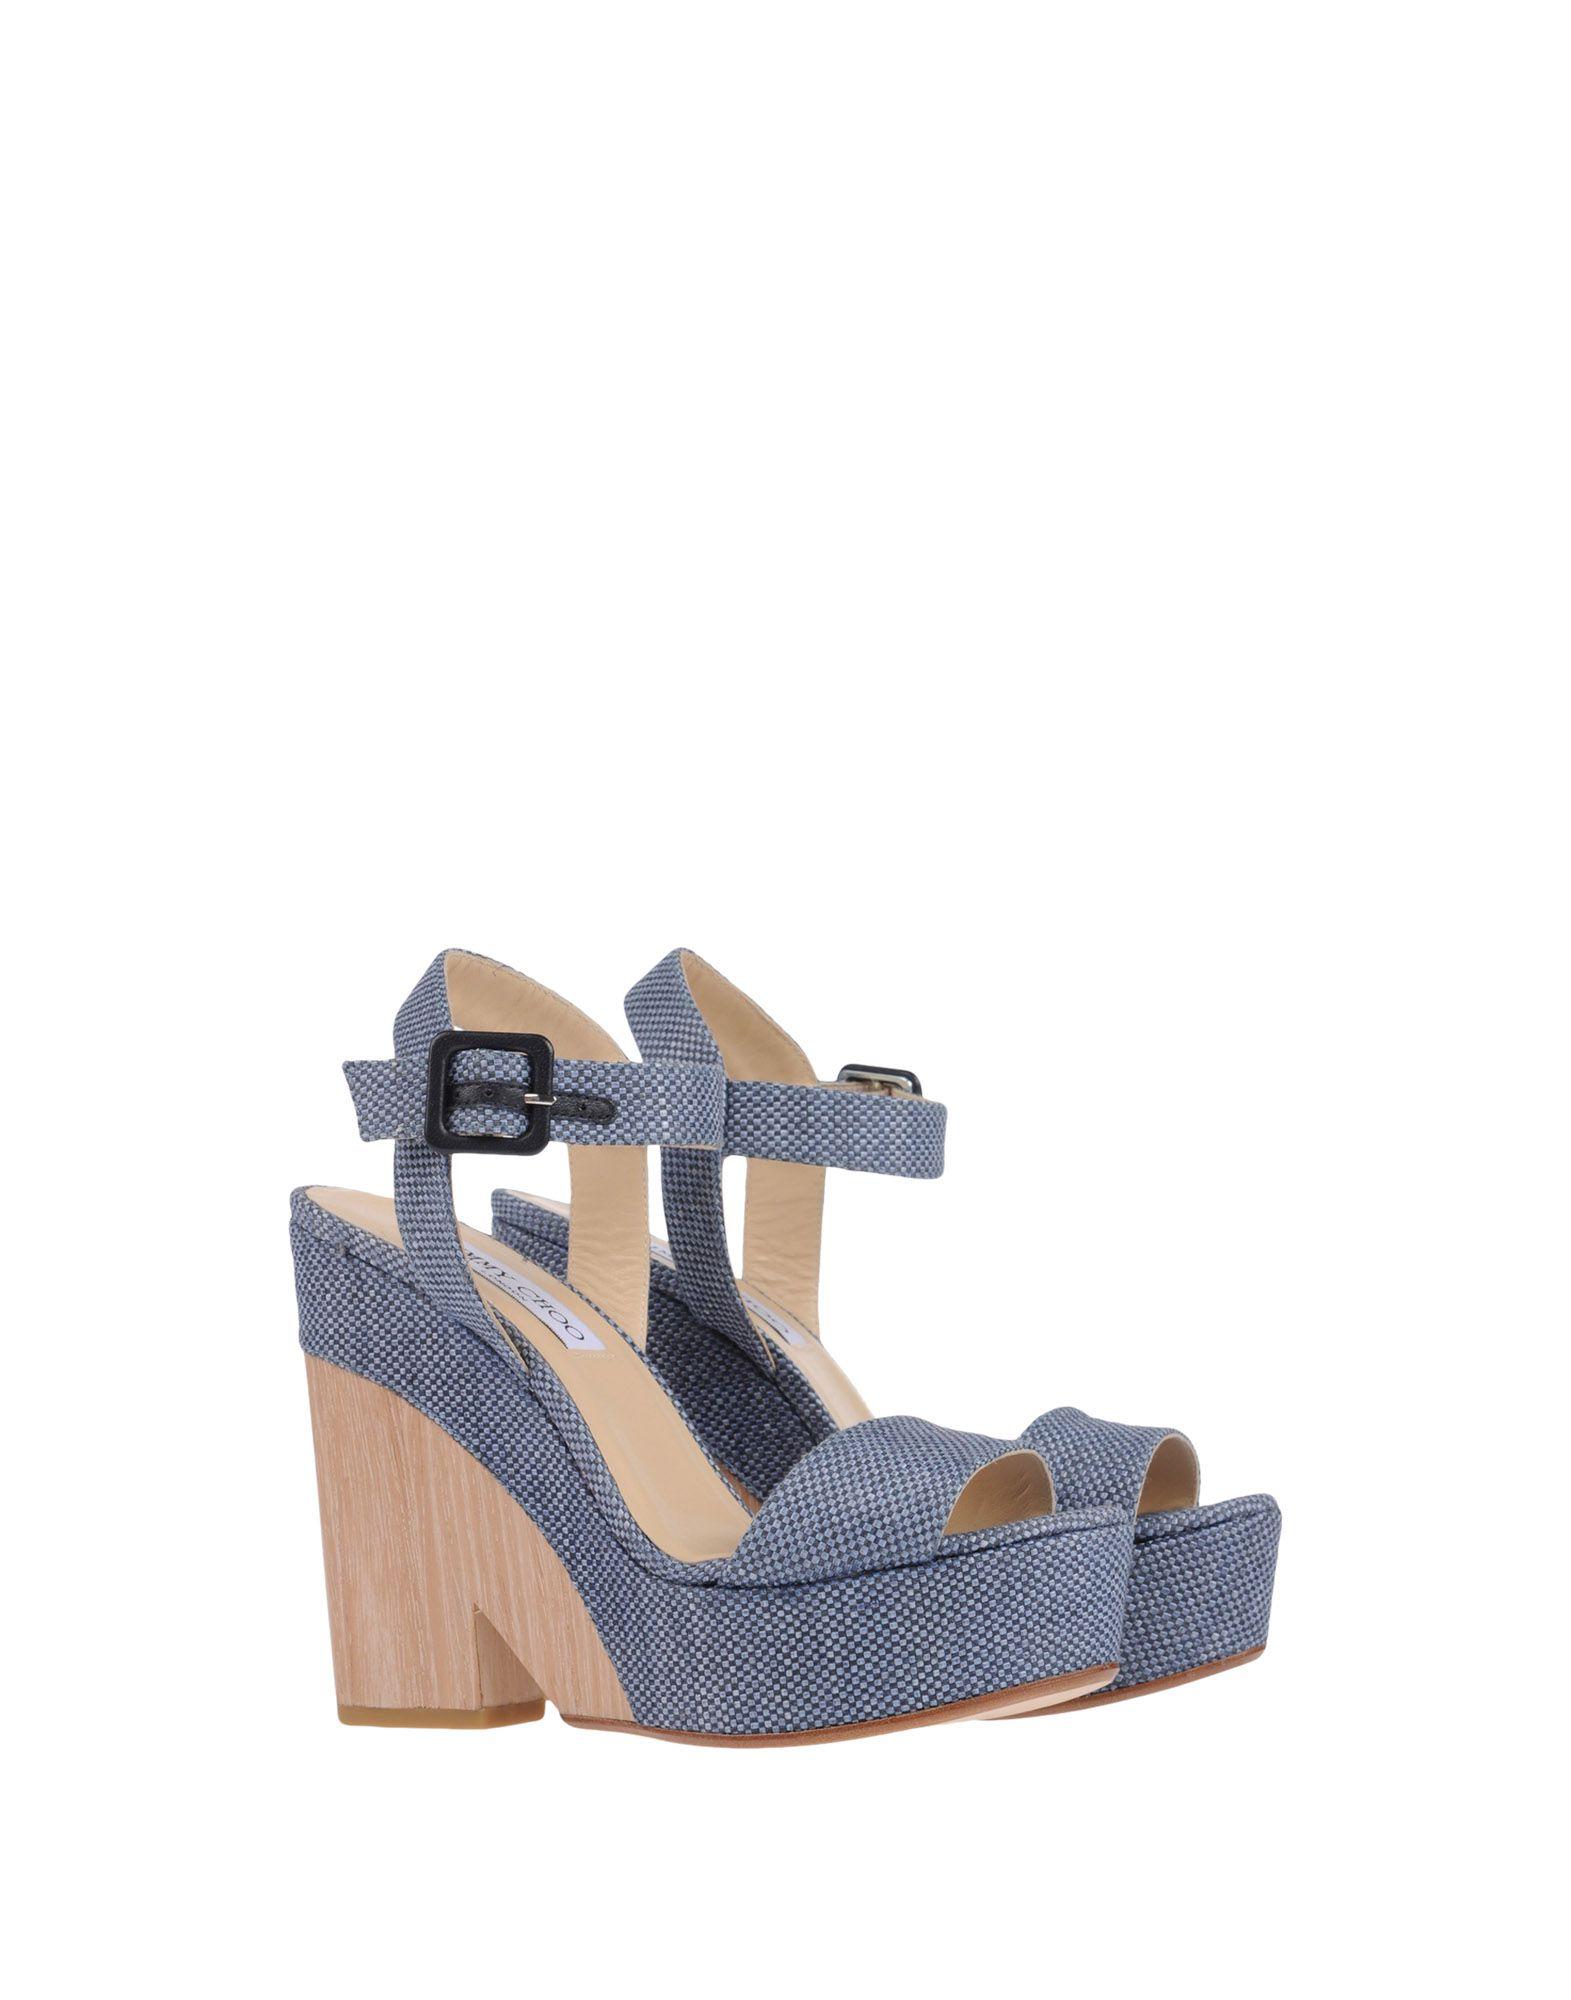 Jimmy Choo Sandalen Damen  11233501JKGut aussehende strapazierfähige Schuhe